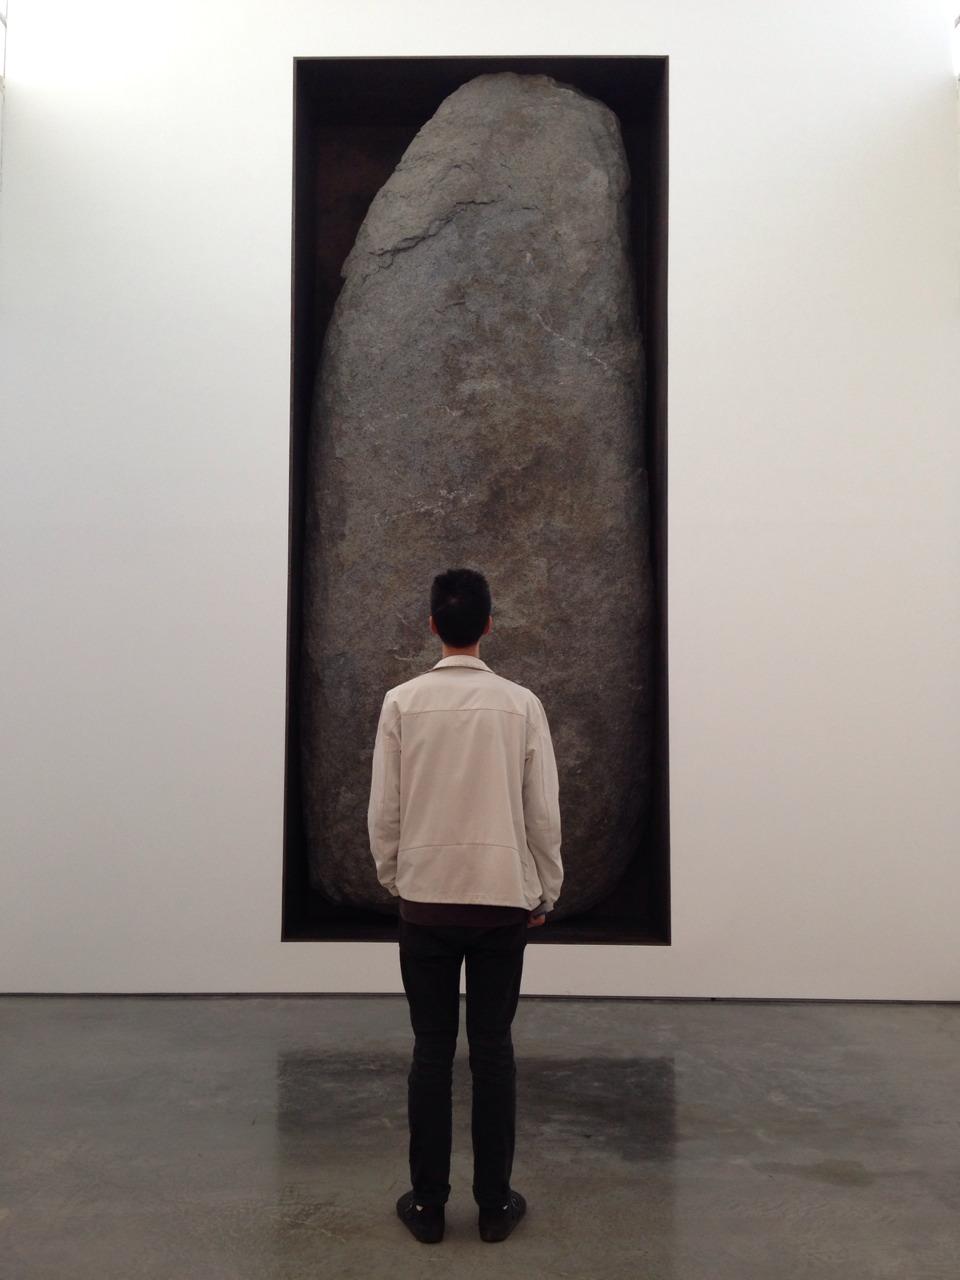 In the presence of Michael Heizer, after Caspar David Friedrich